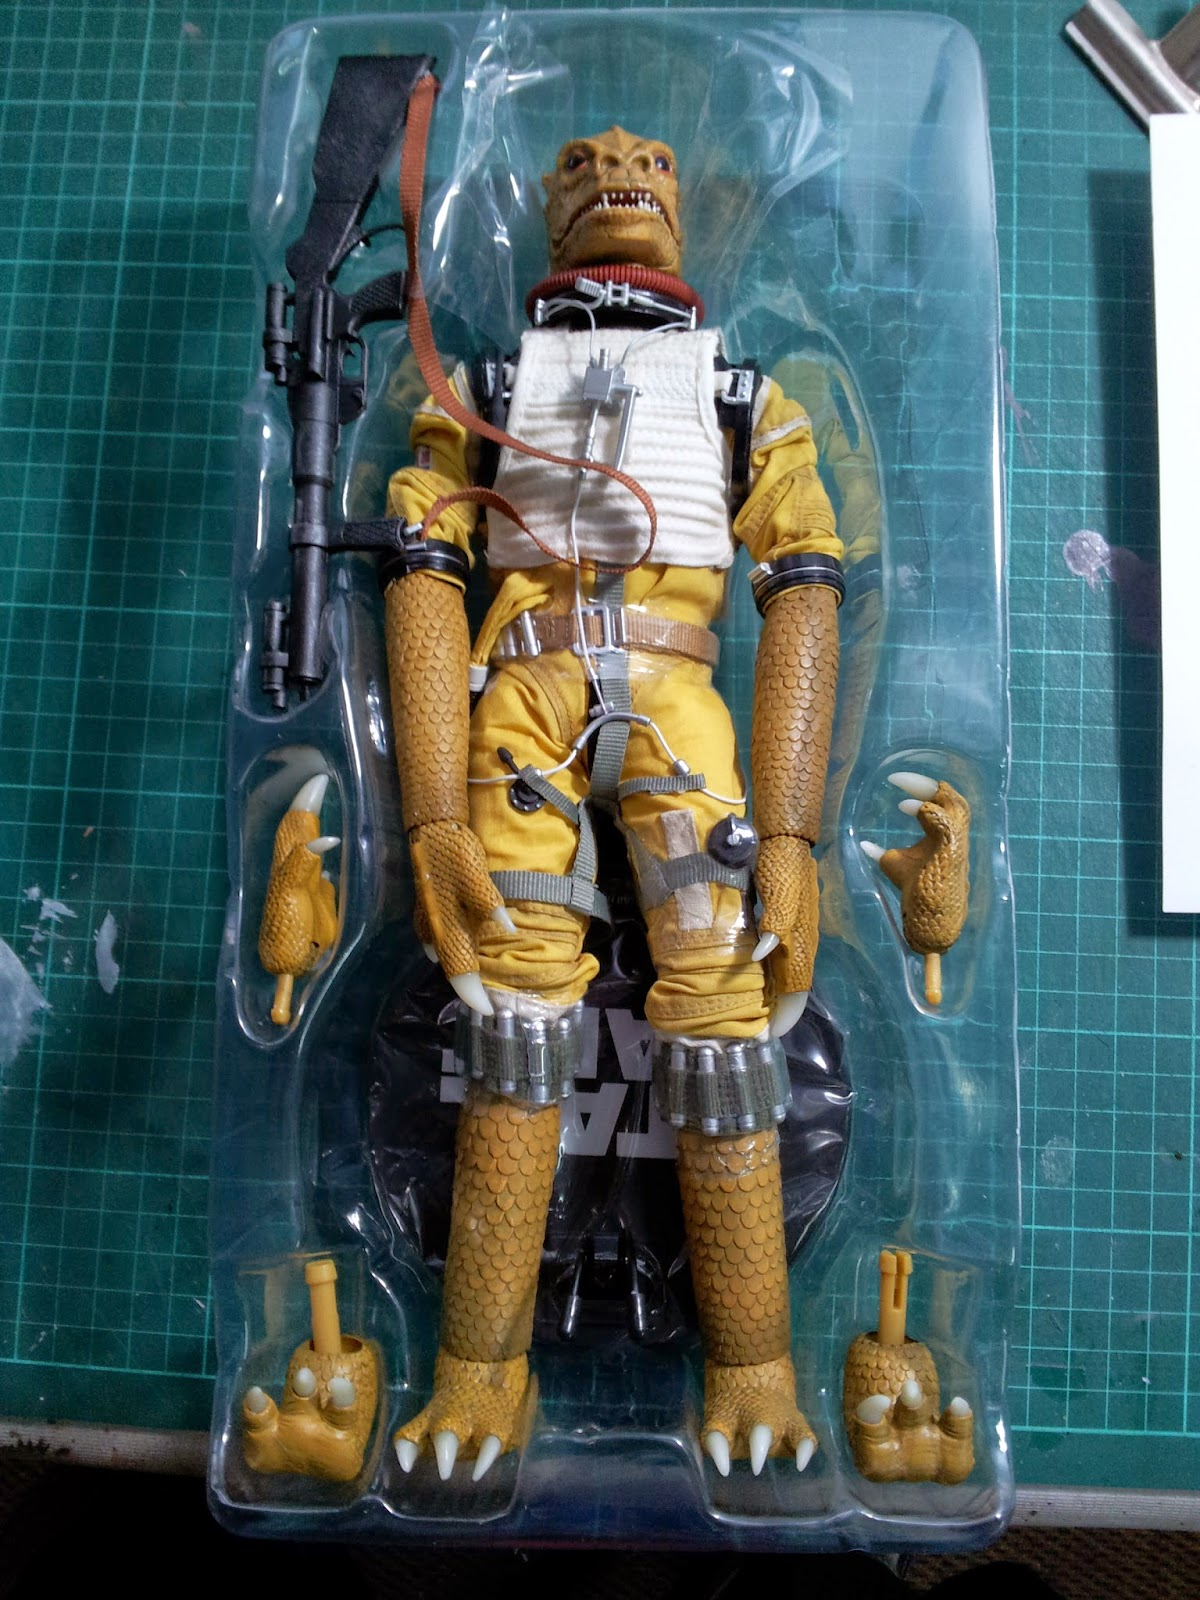 Kw Miniature Customize Sideshow Star Wars Bossk